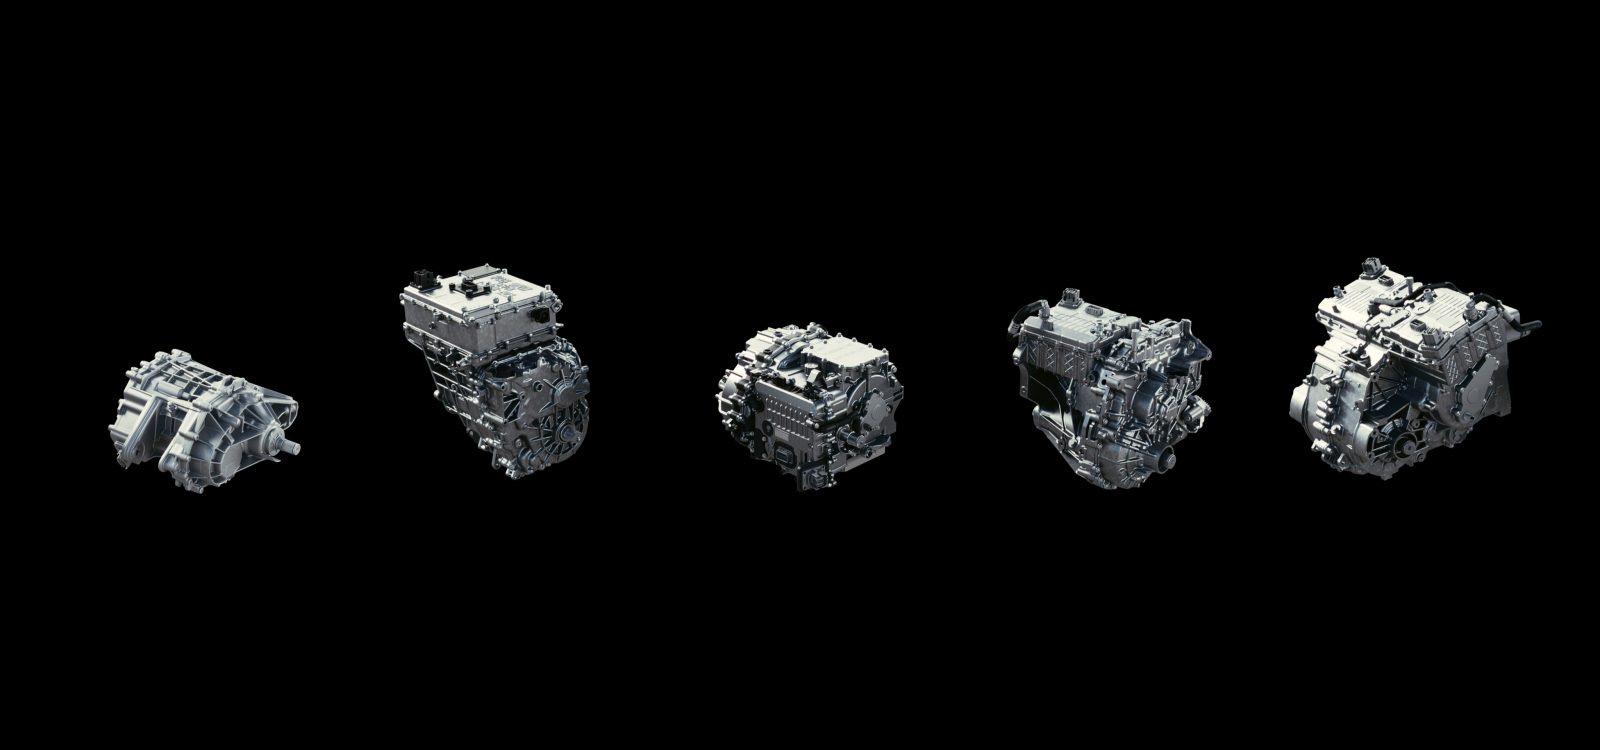 GM unveils its lineup of Ultium electric drive units